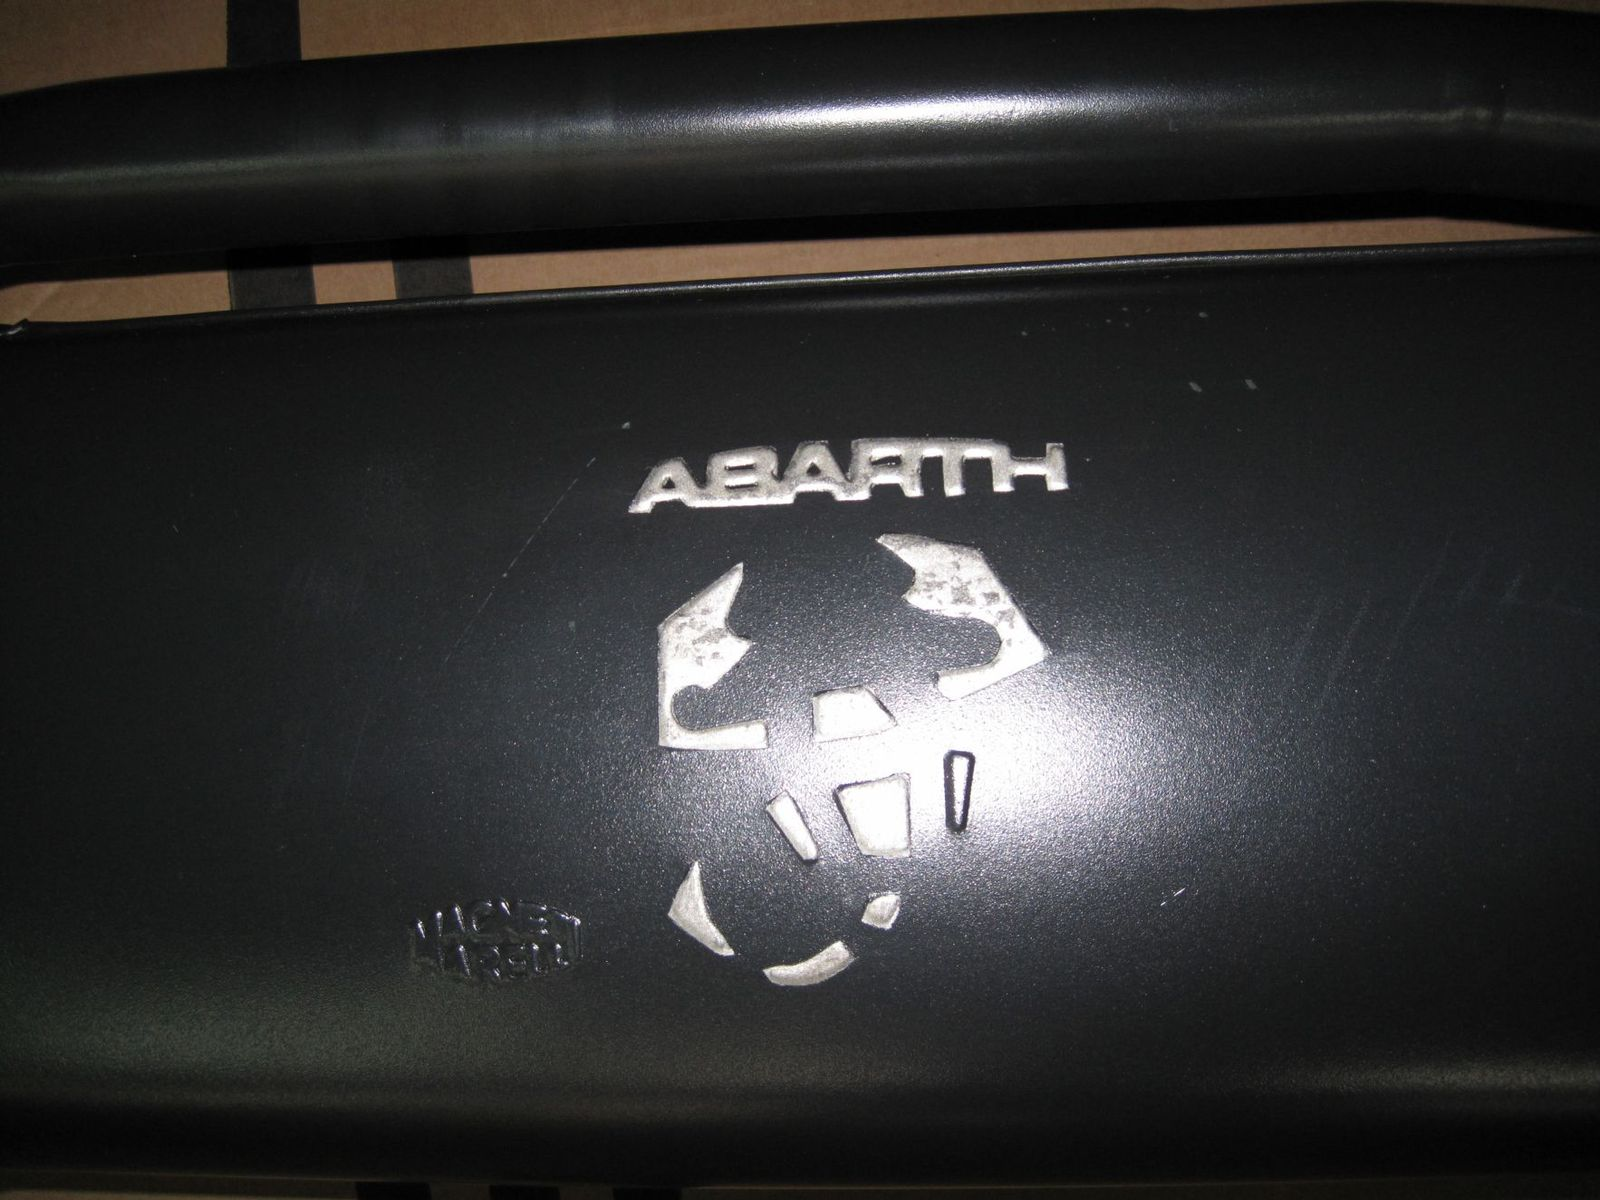 Abarthex04